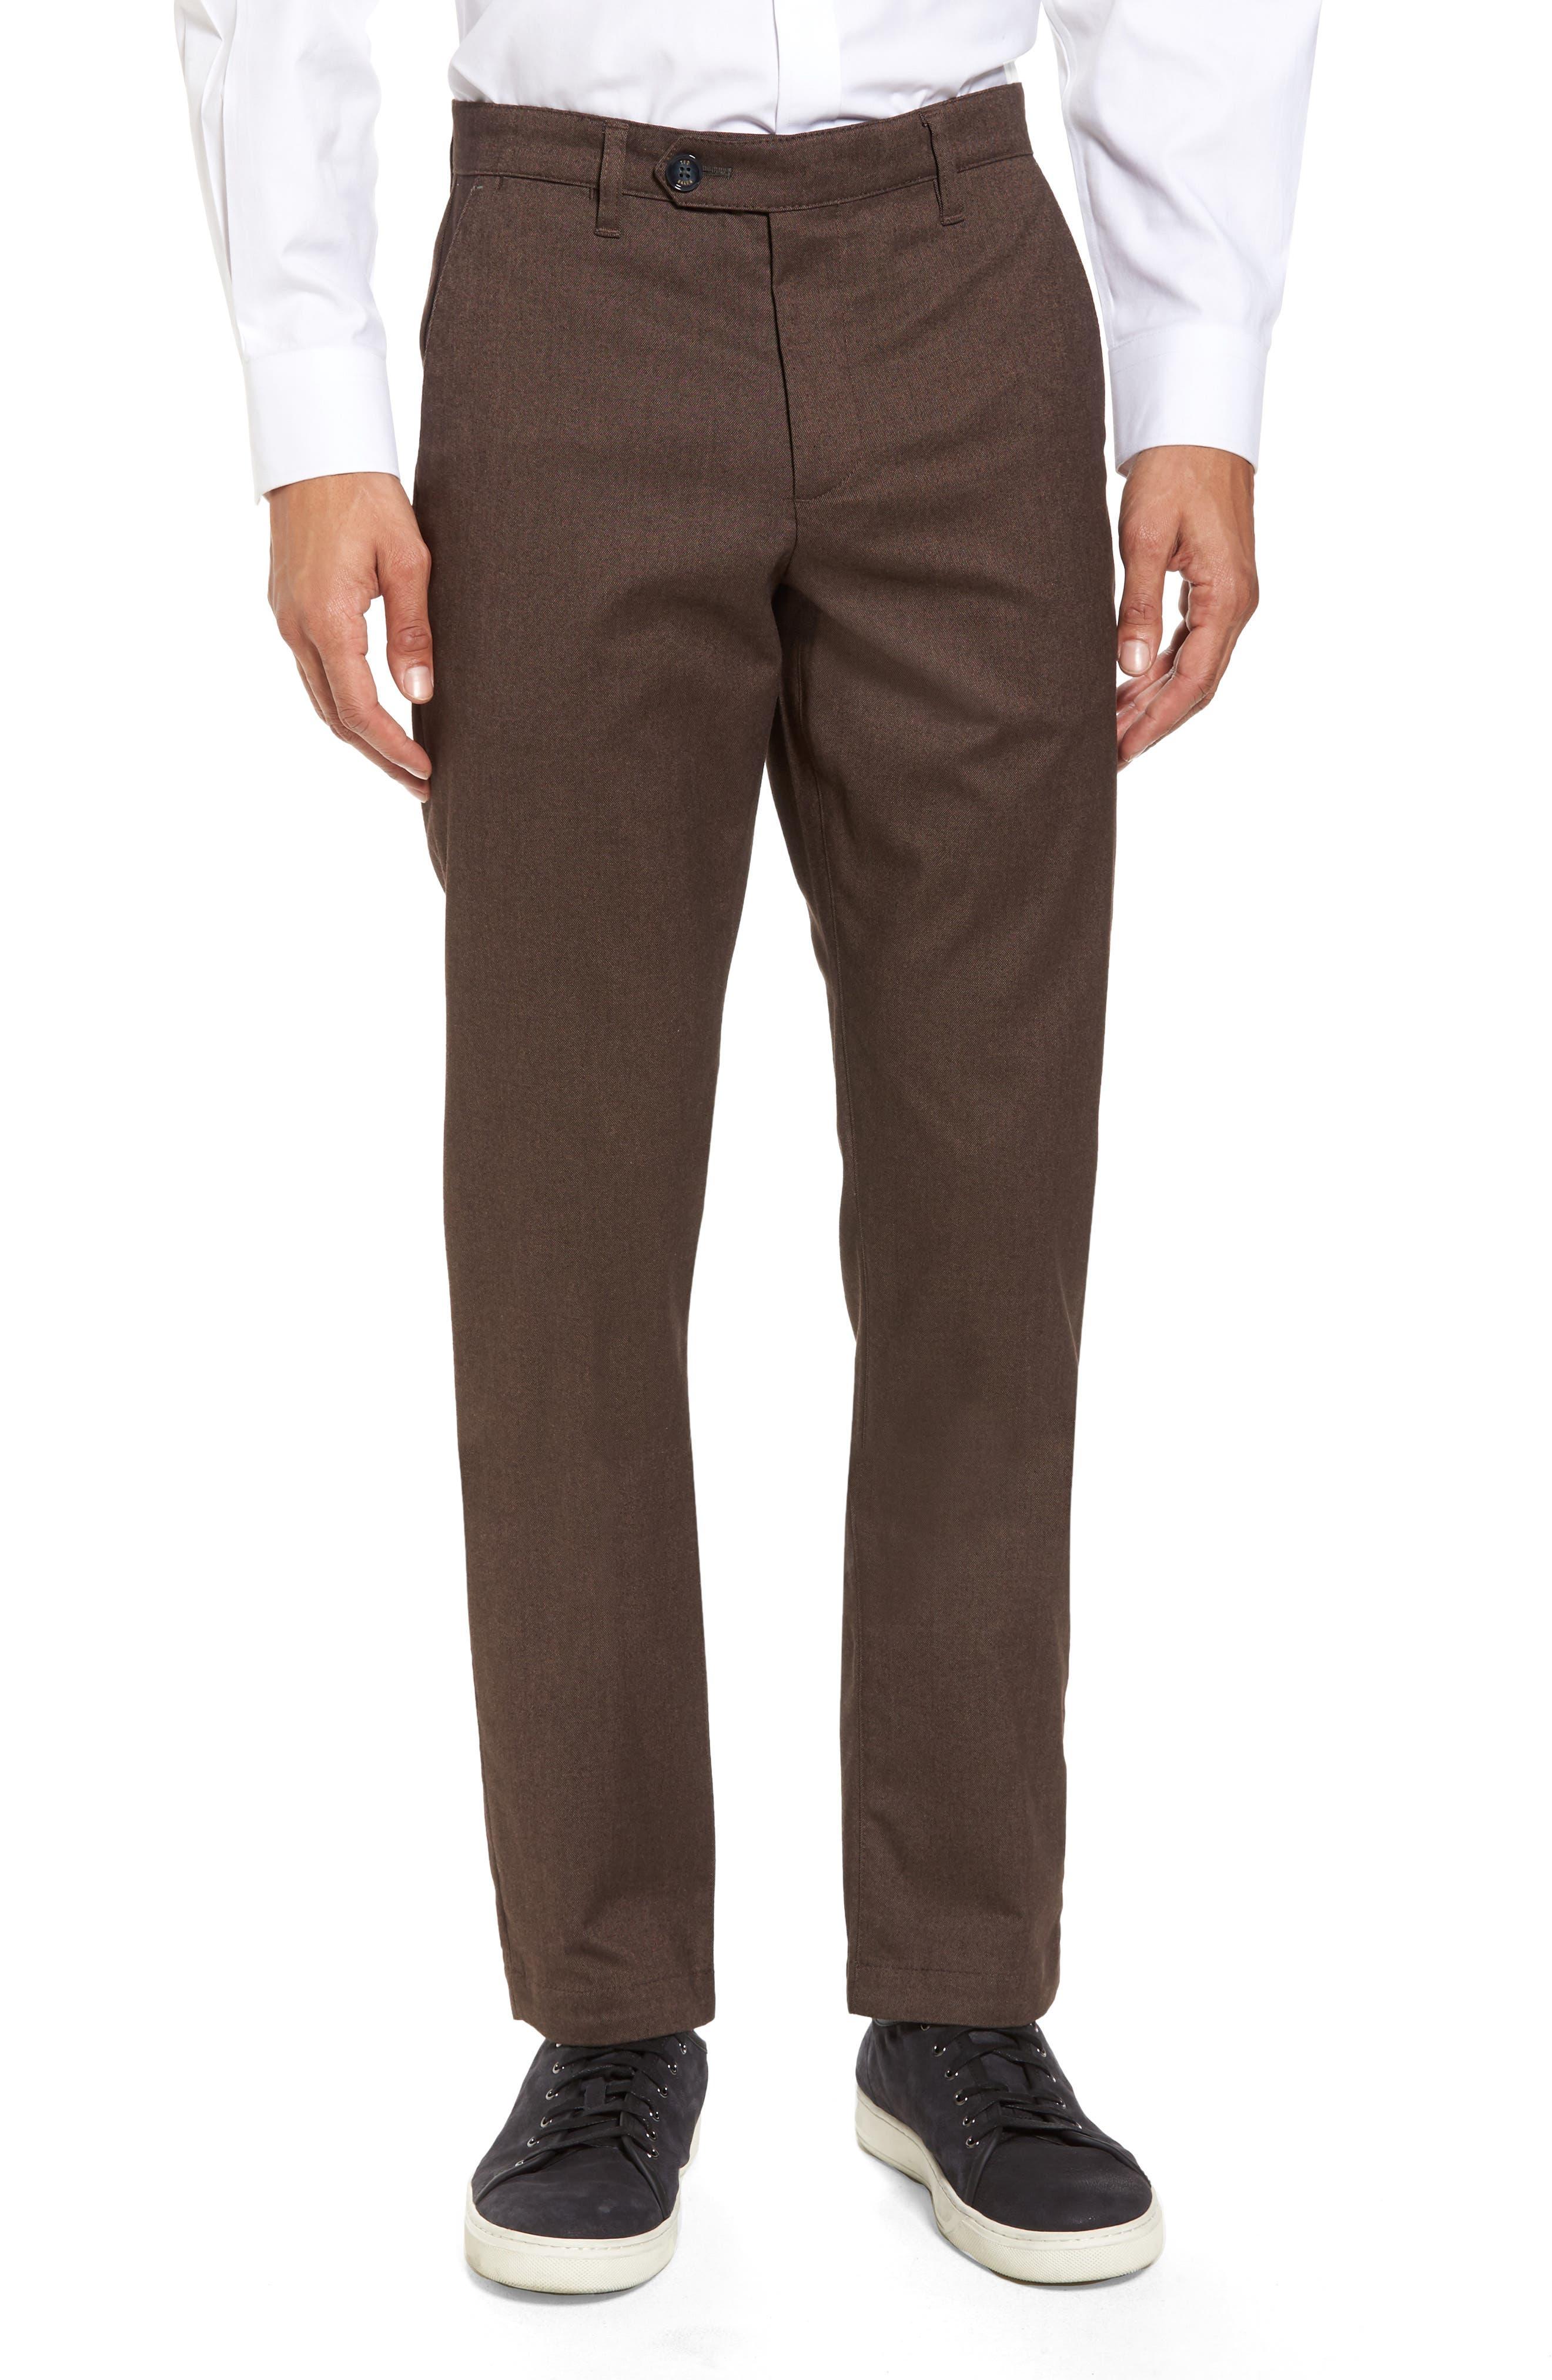 Freshman Modern Fit Brushed Pants,                             Main thumbnail 1, color,                             214